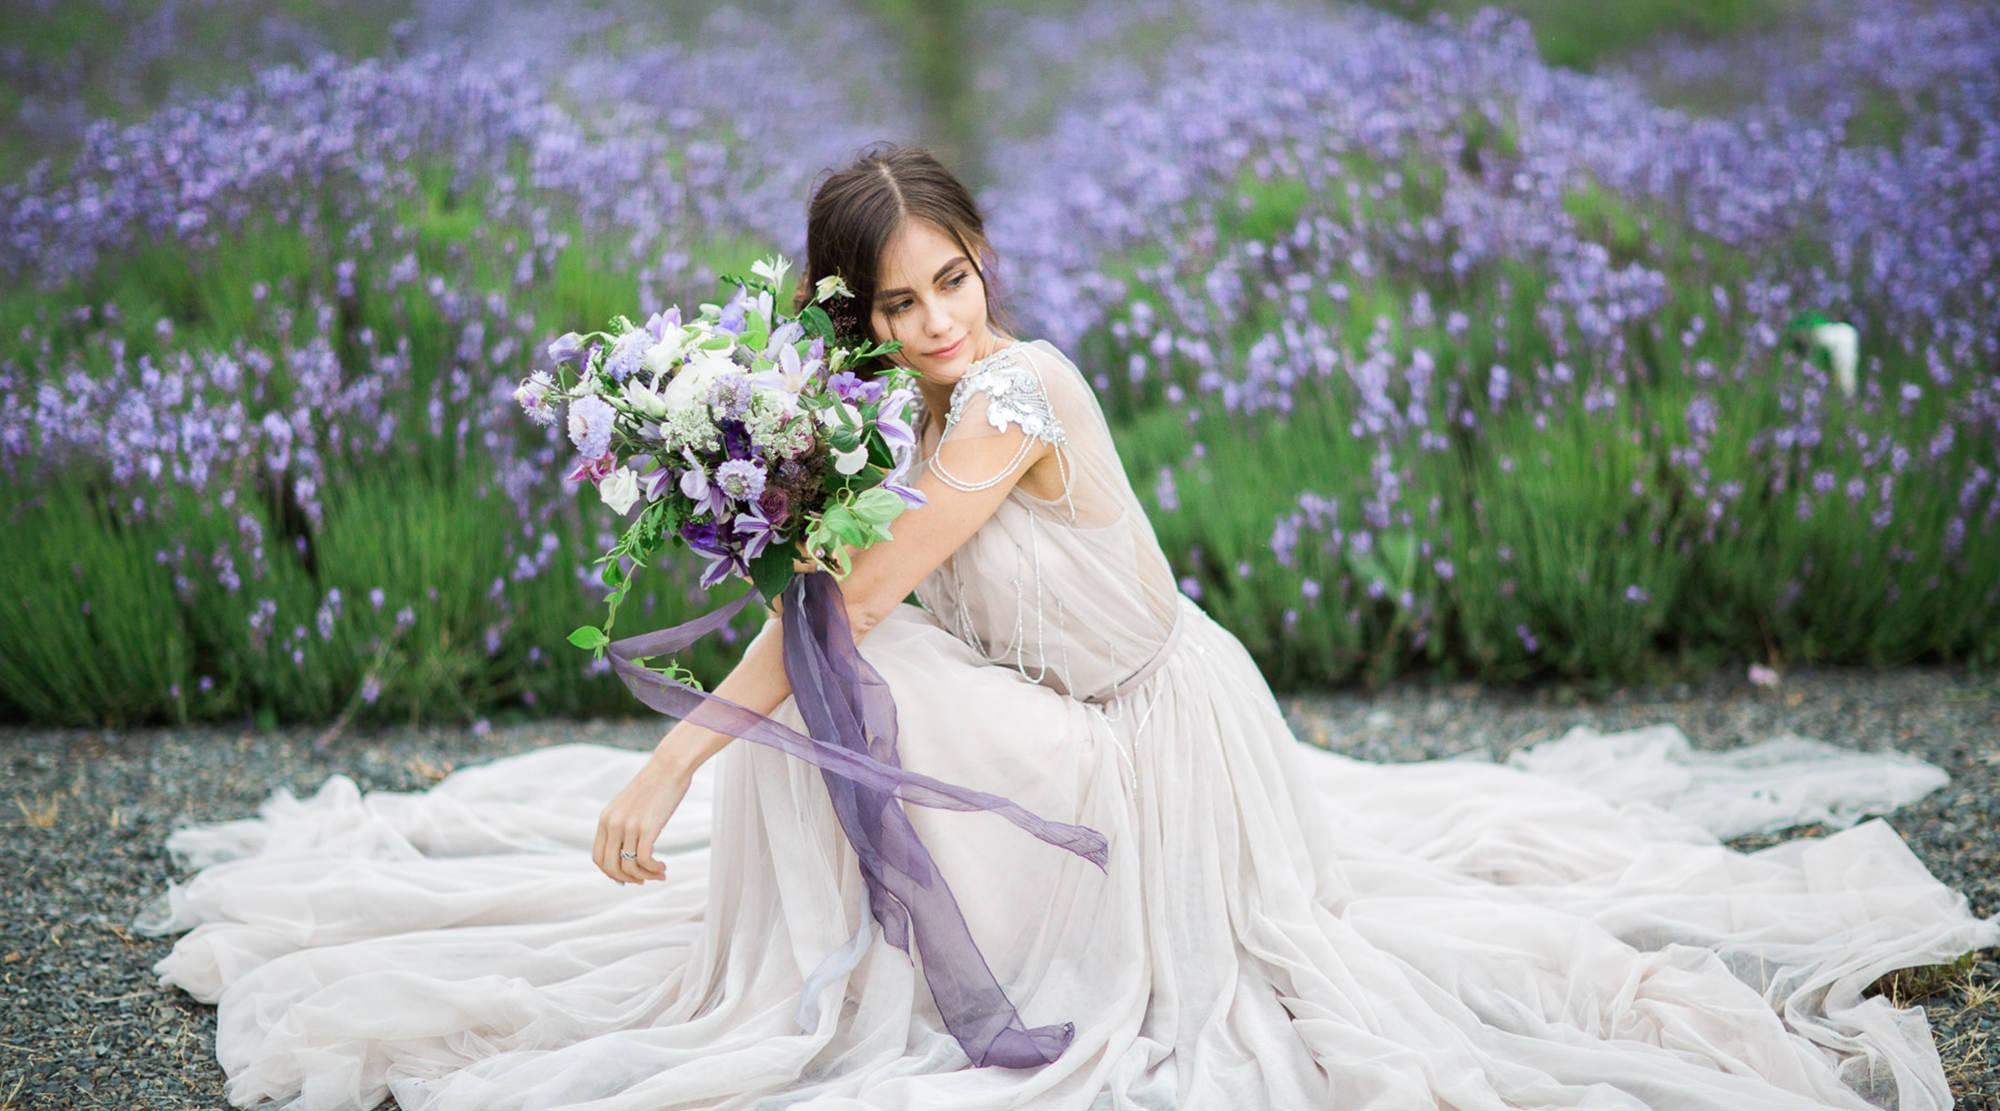 Photo credit: Photography: Maru Photography; Wedding gown: Luxx Nova '